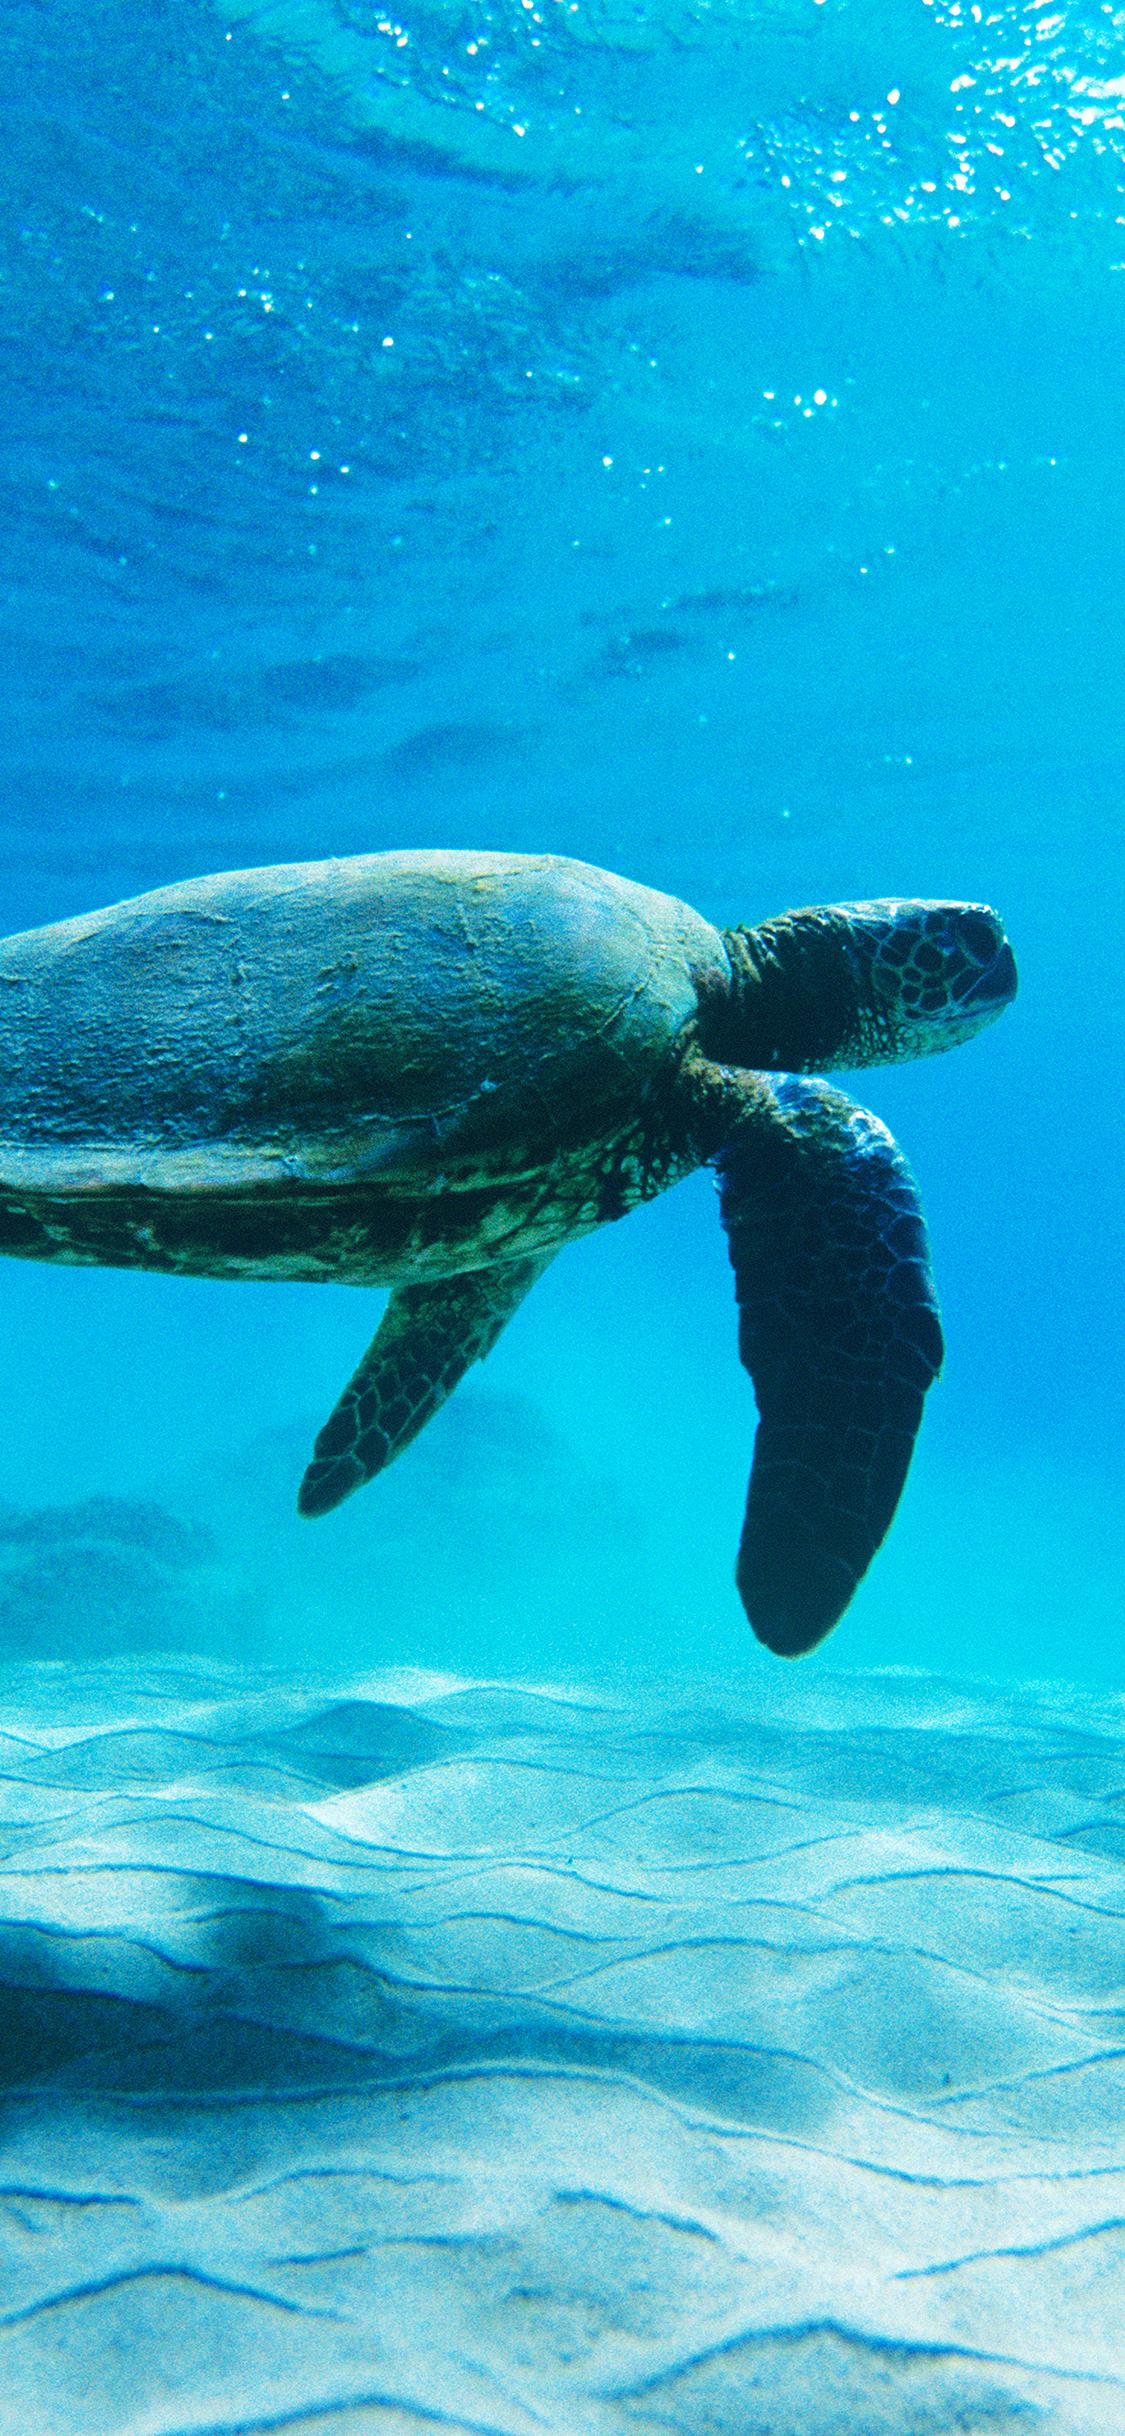 Me62 Turtle Sea Ocean Animal